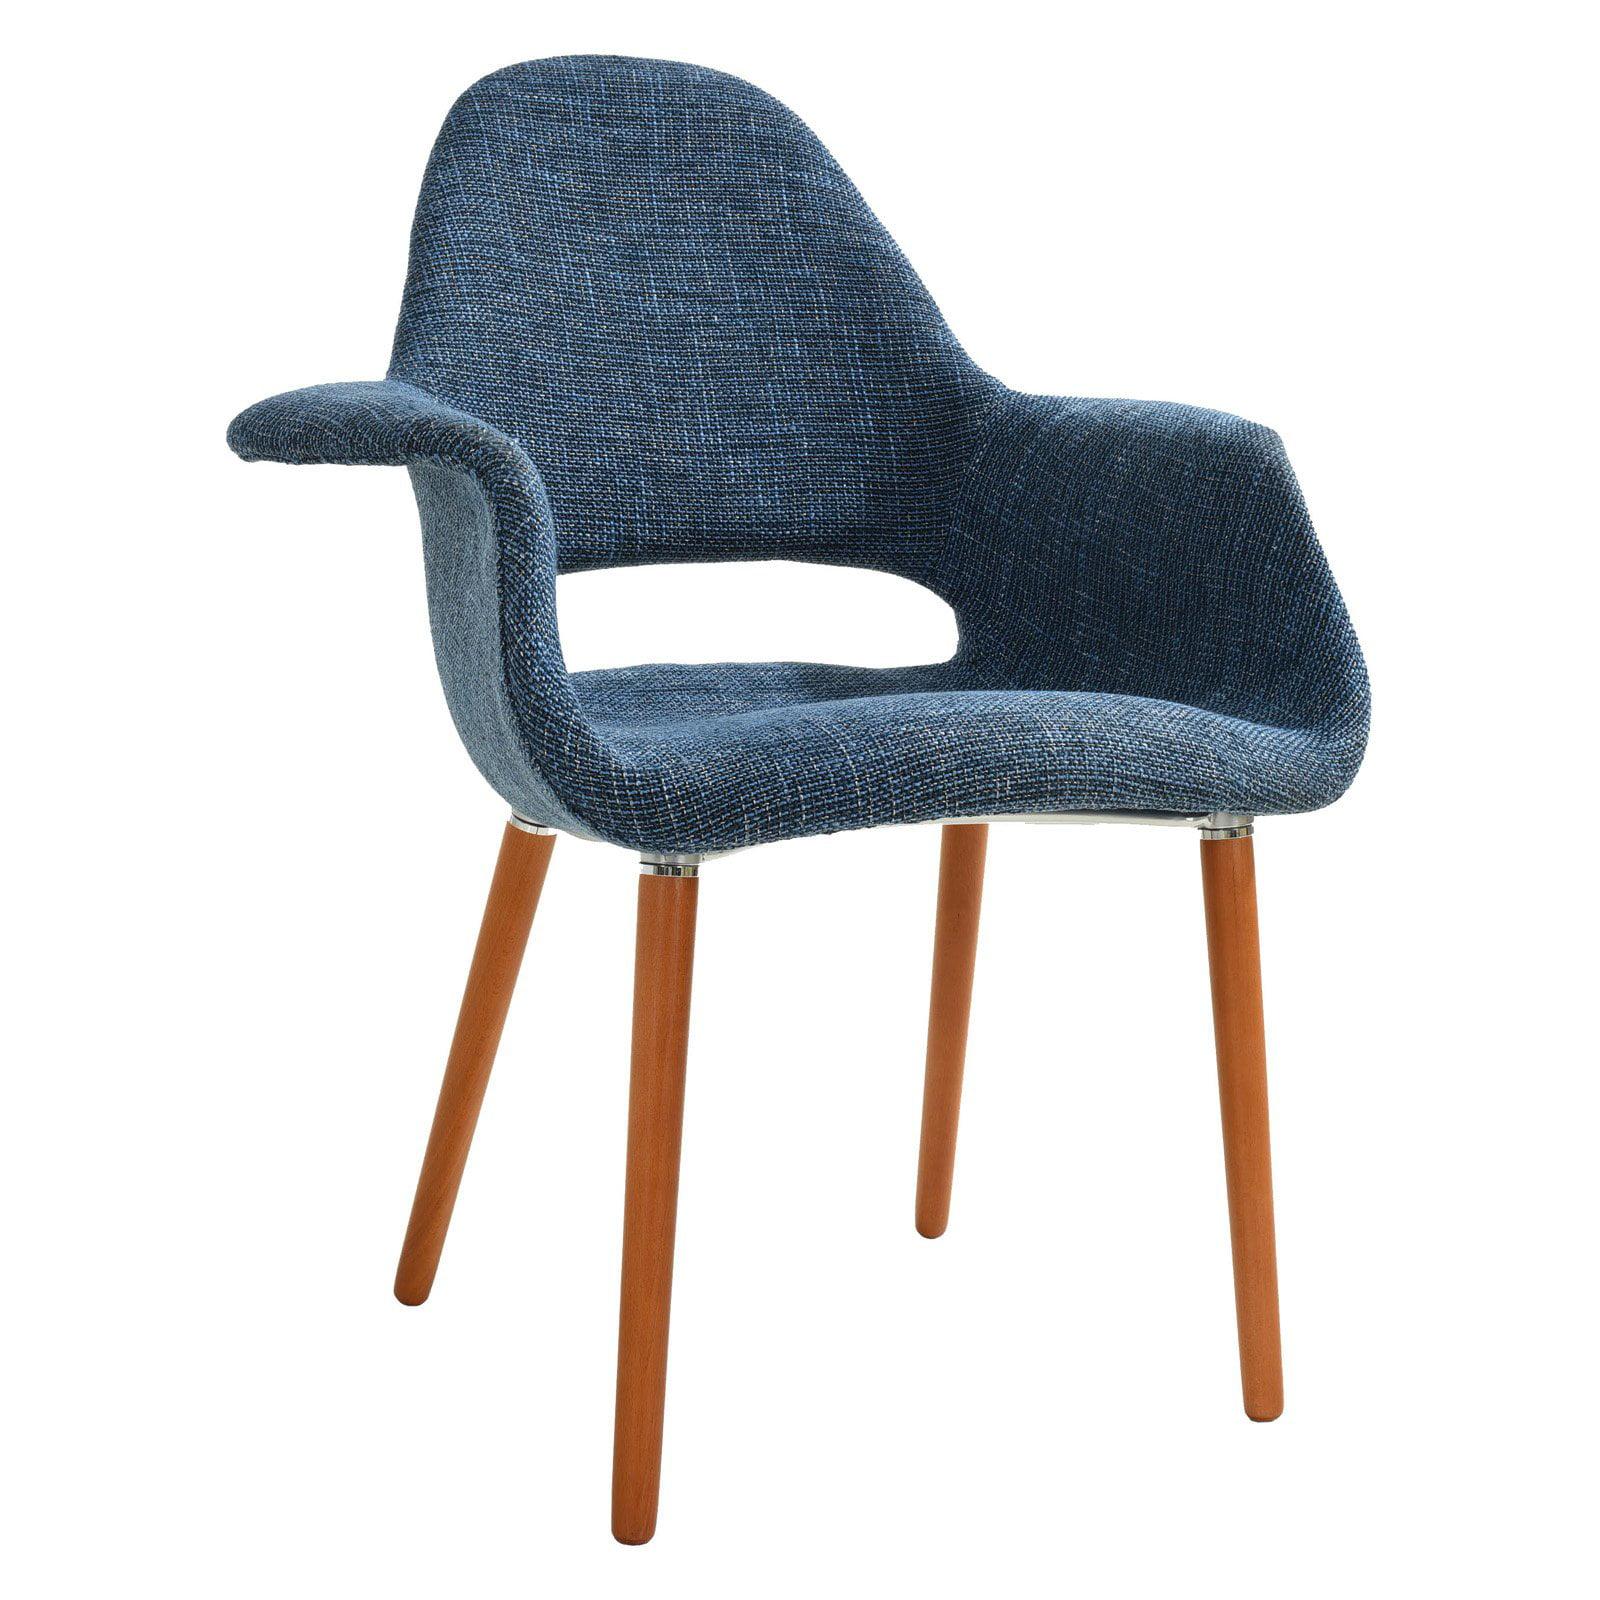 EdgeMod Barclay Dining Chair